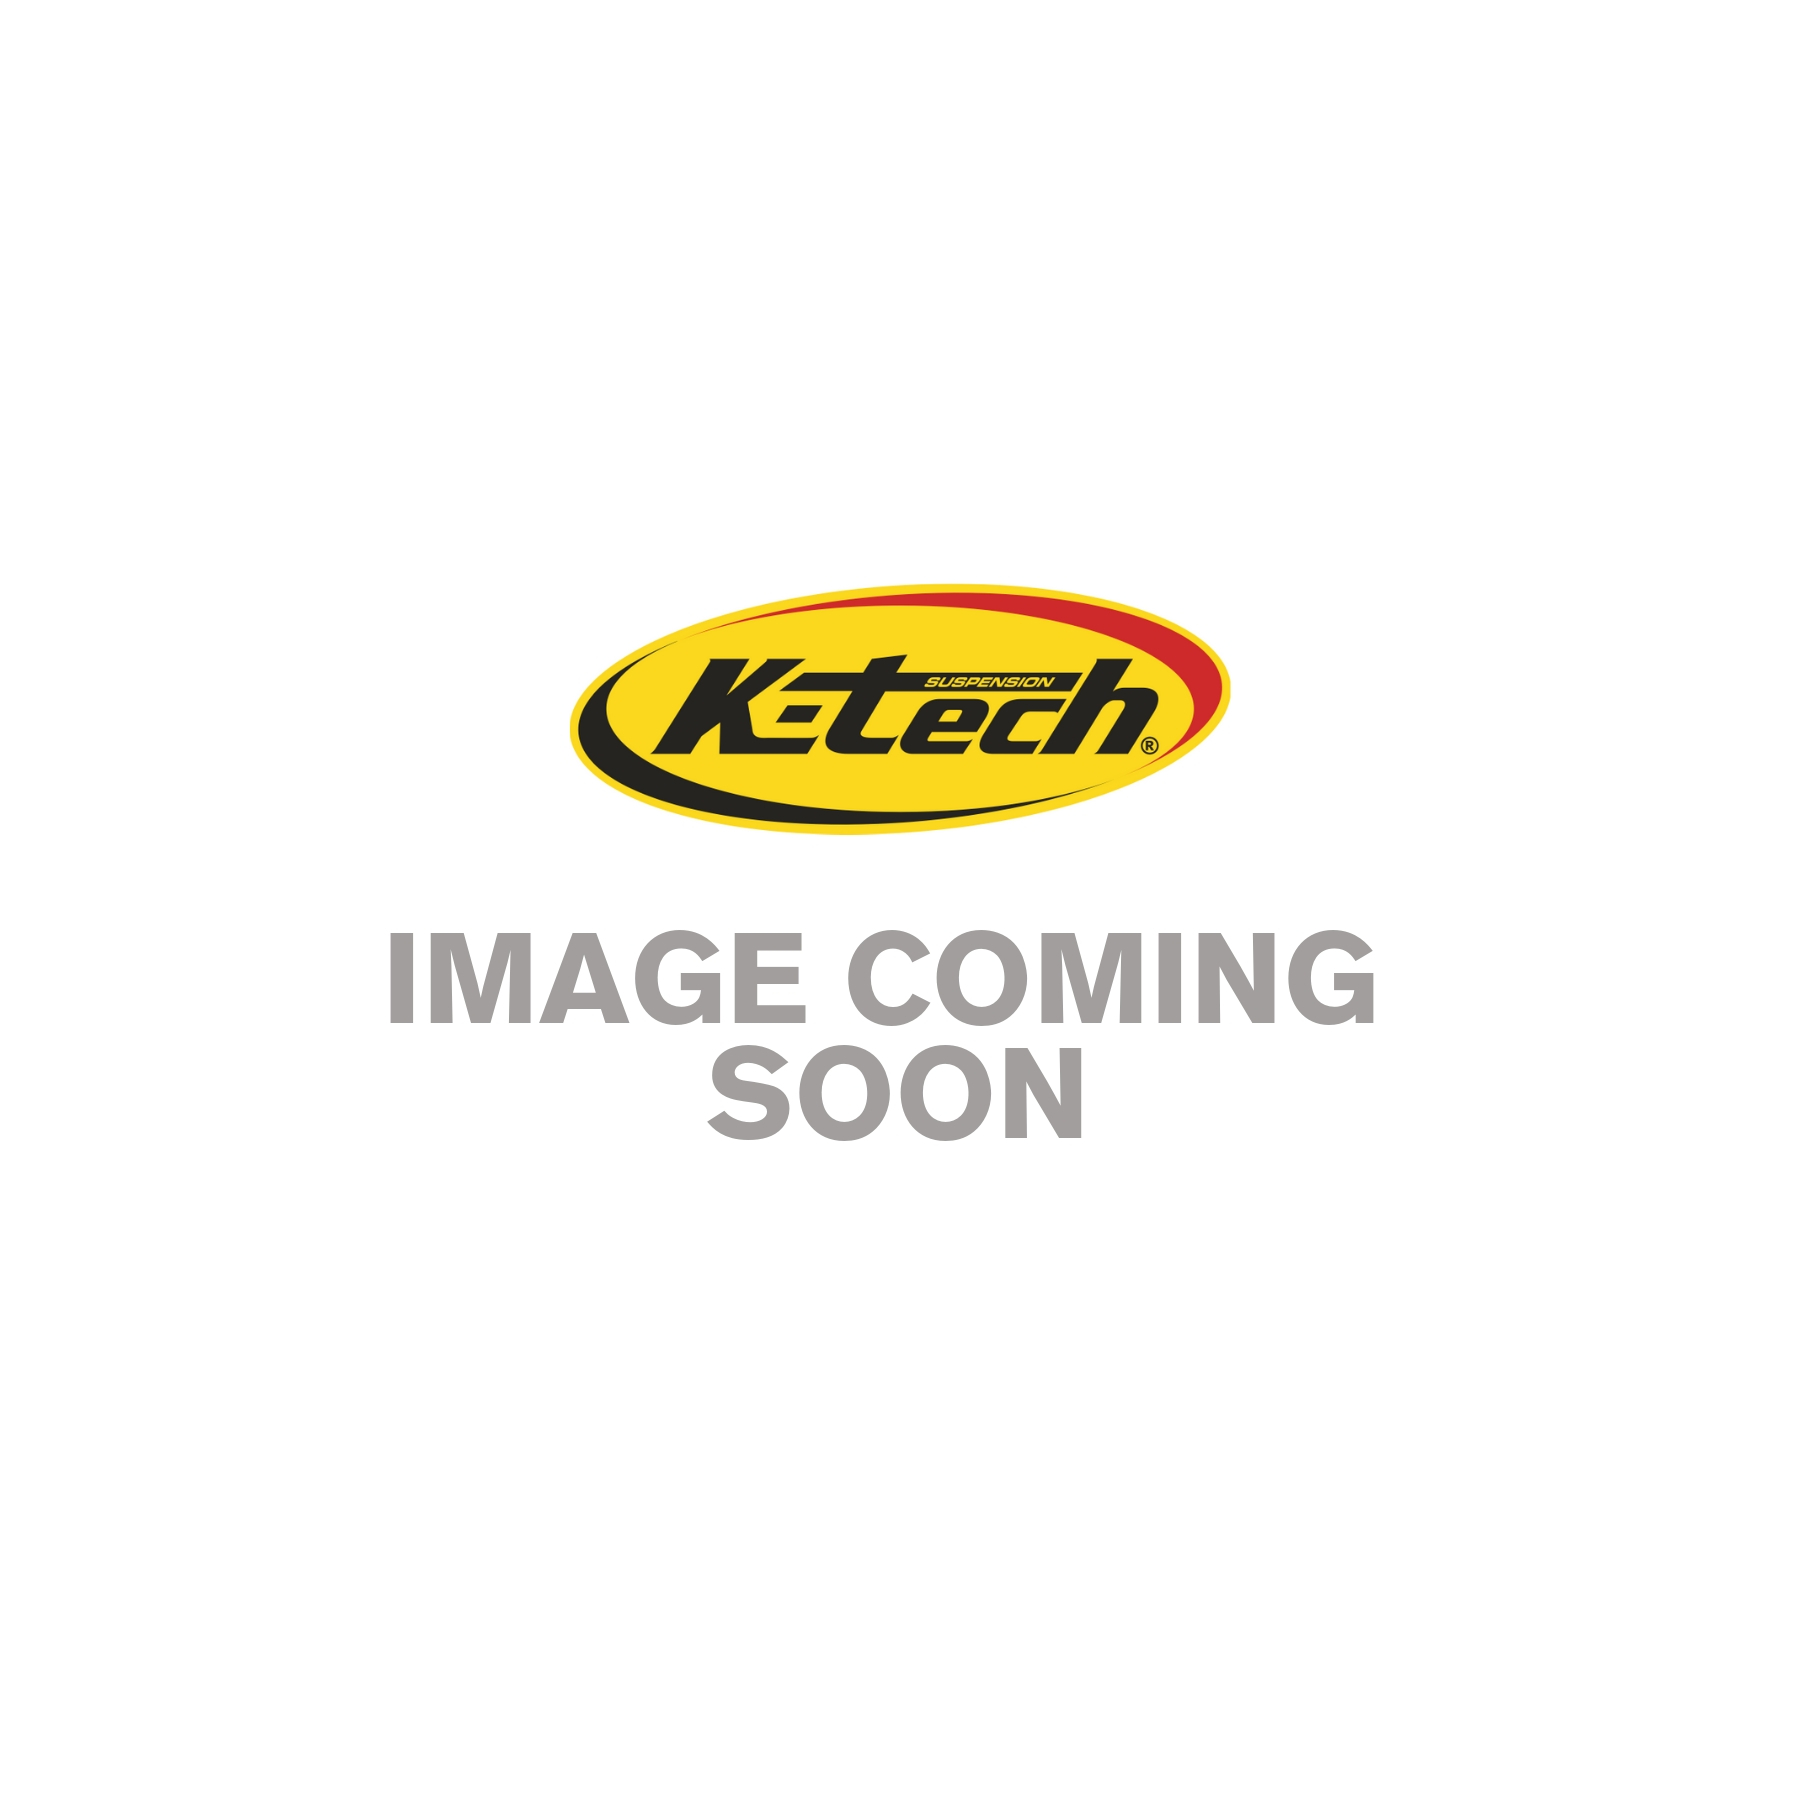 DDS Pro Shock Absorber Triumph Daytona 675/675R 2006-2012